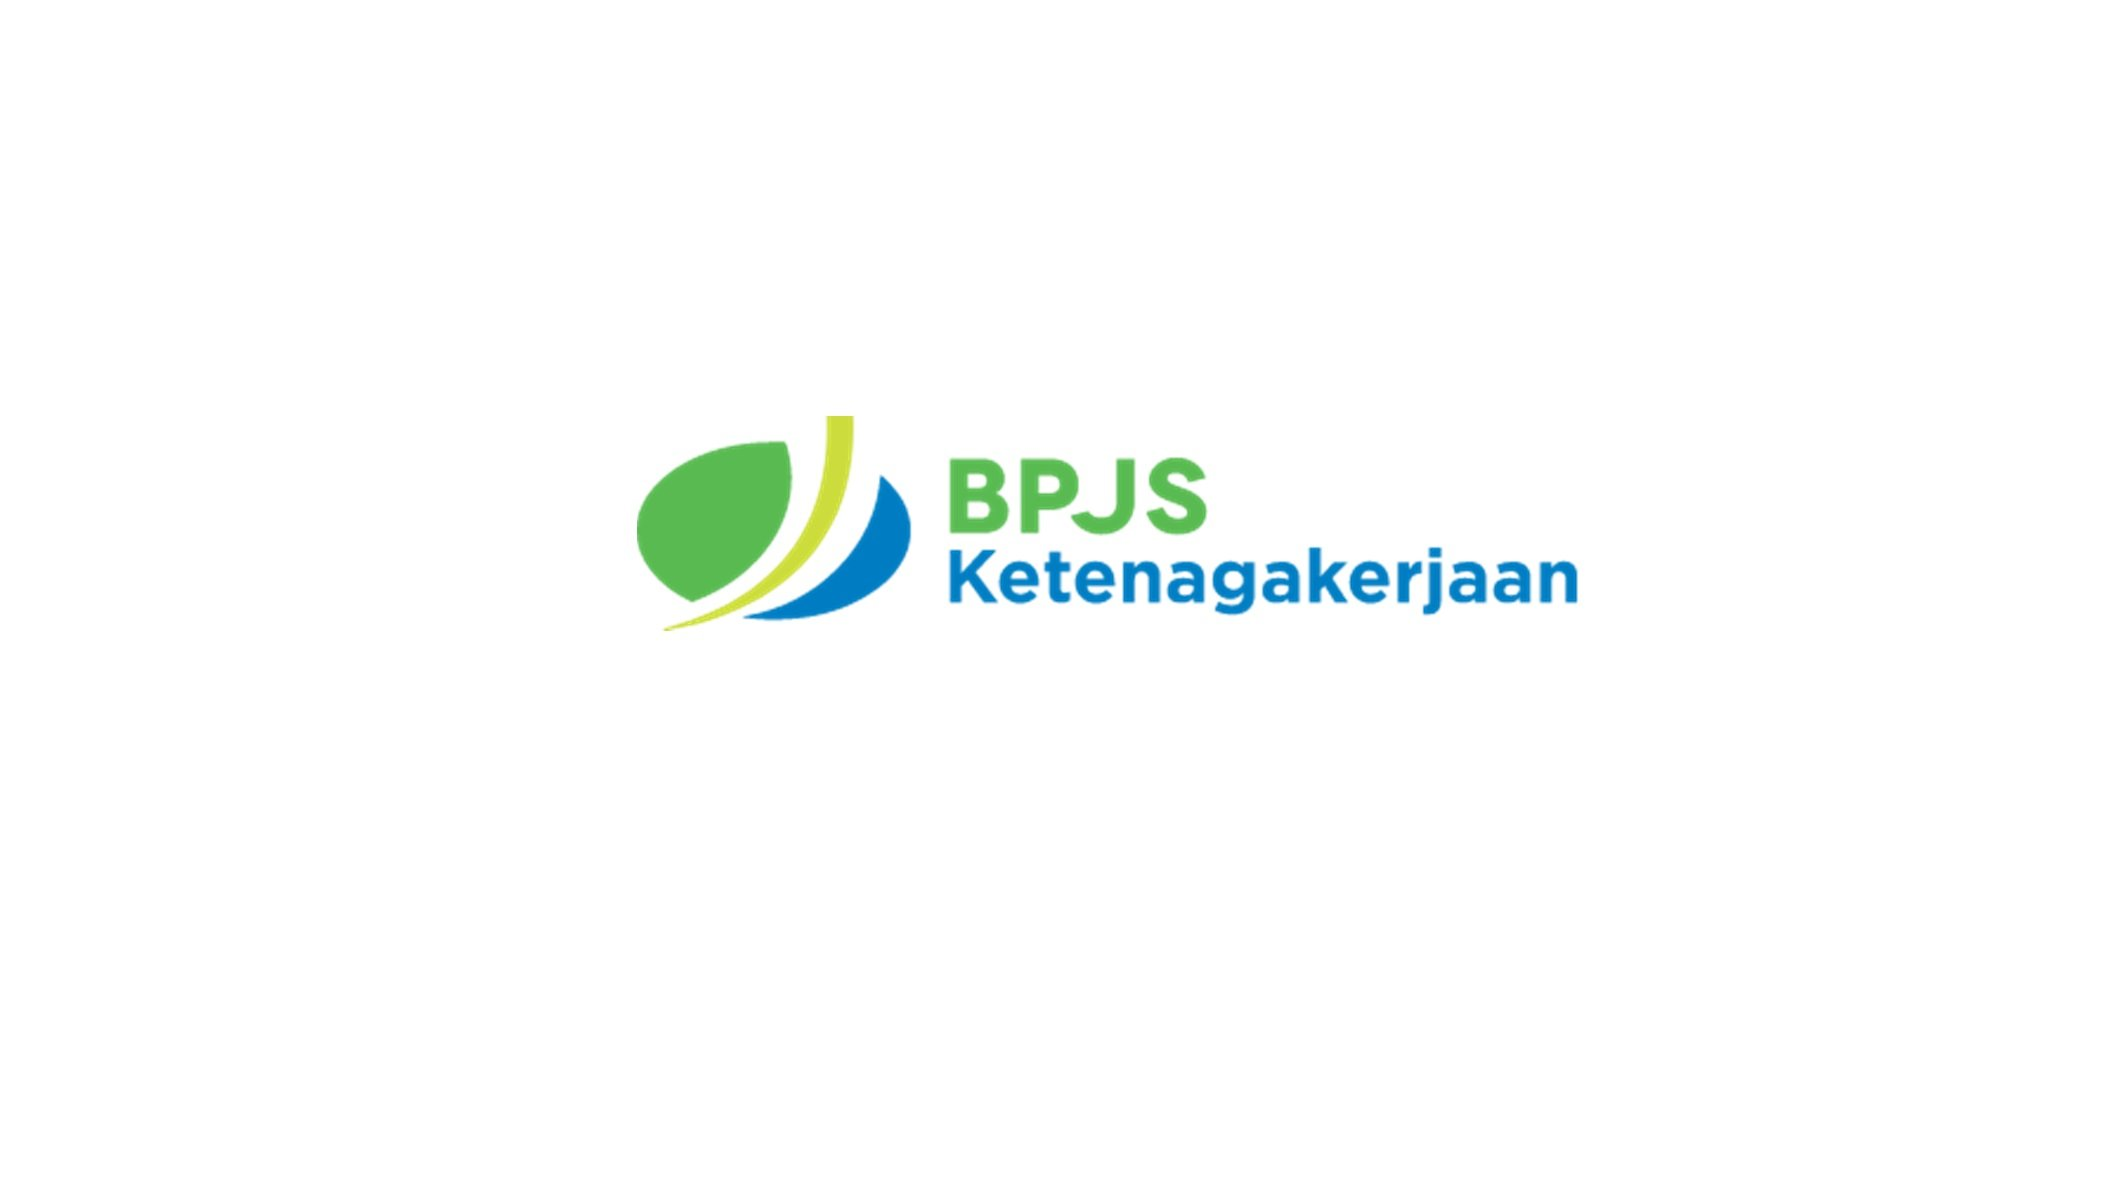 Logo BPJS Ketenagakerjaan.